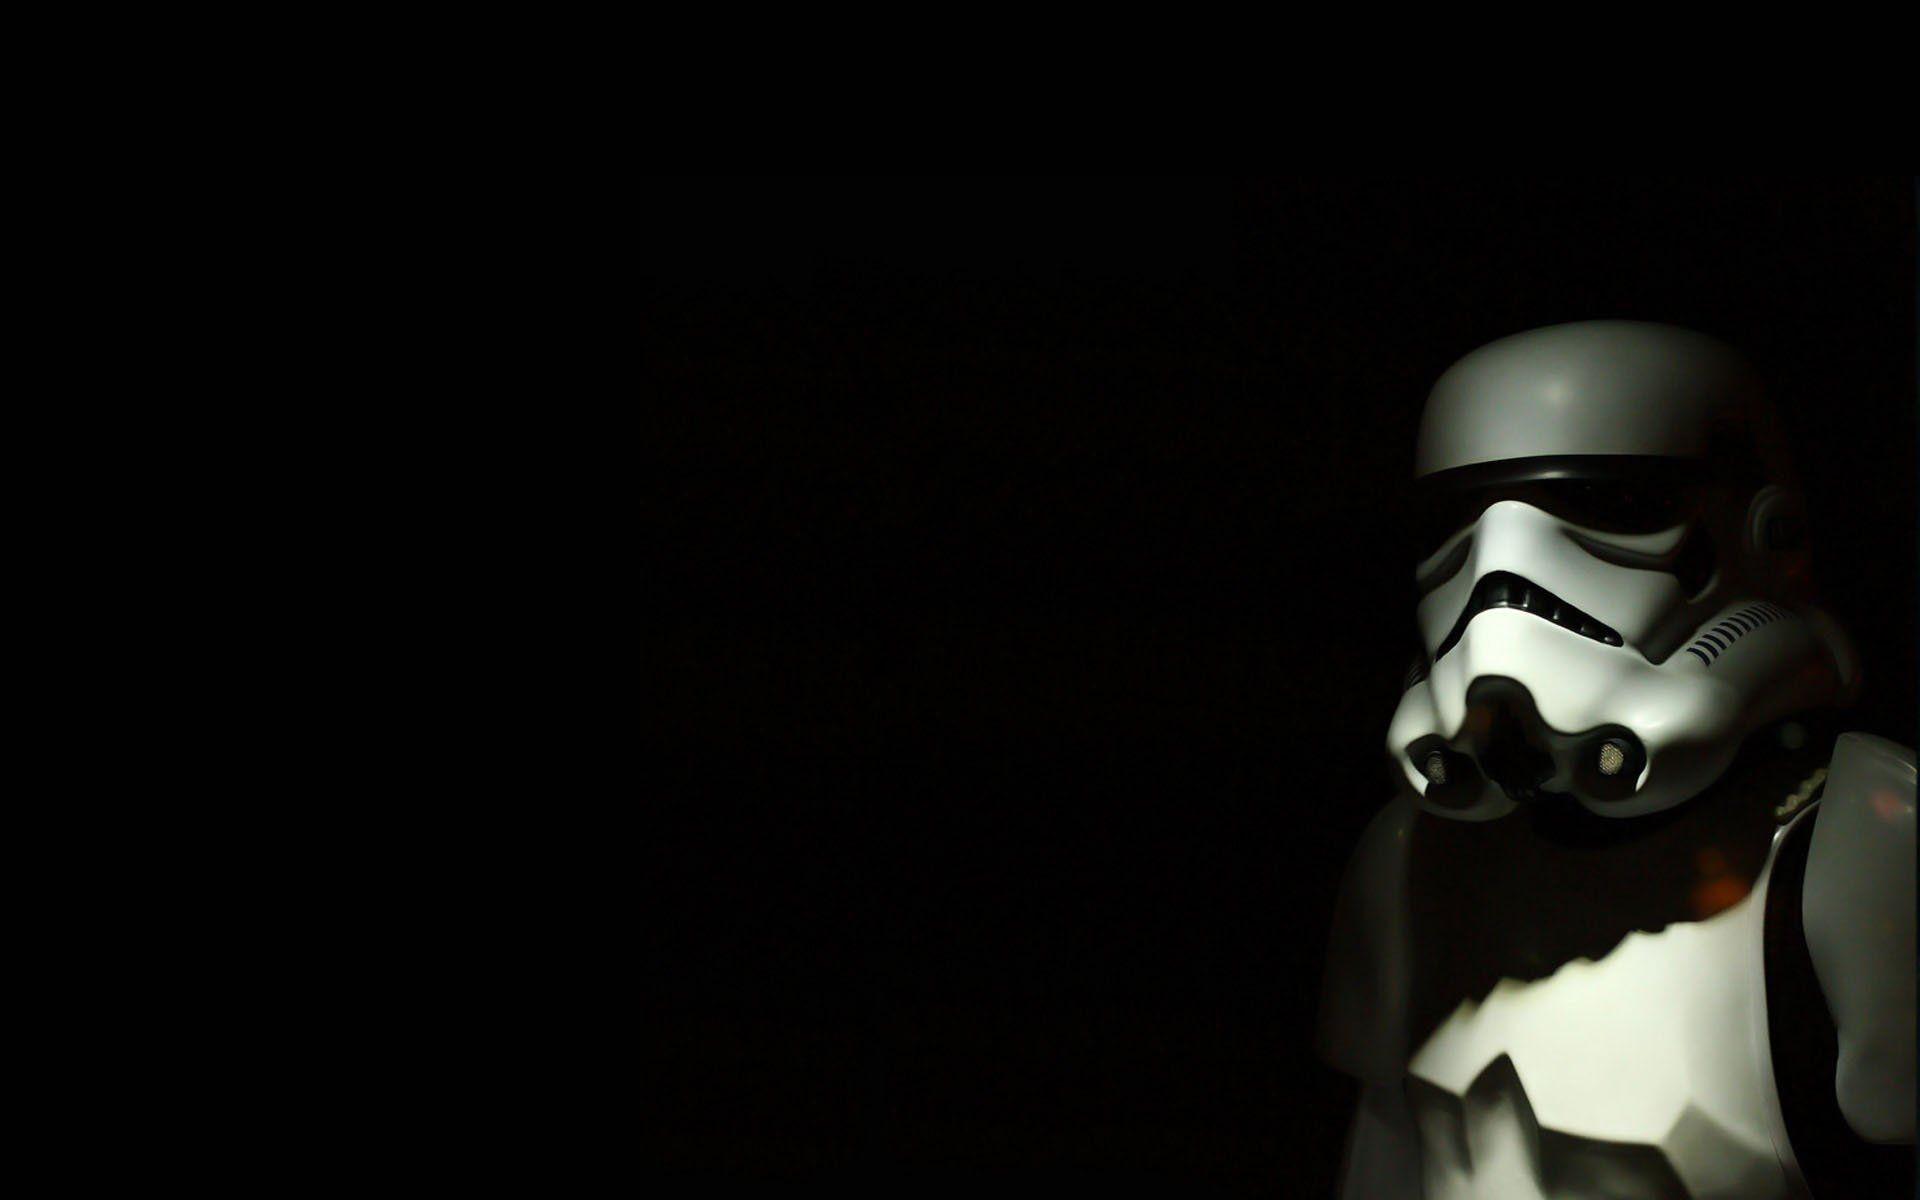 Star Wars Pulp Fiction #1051866